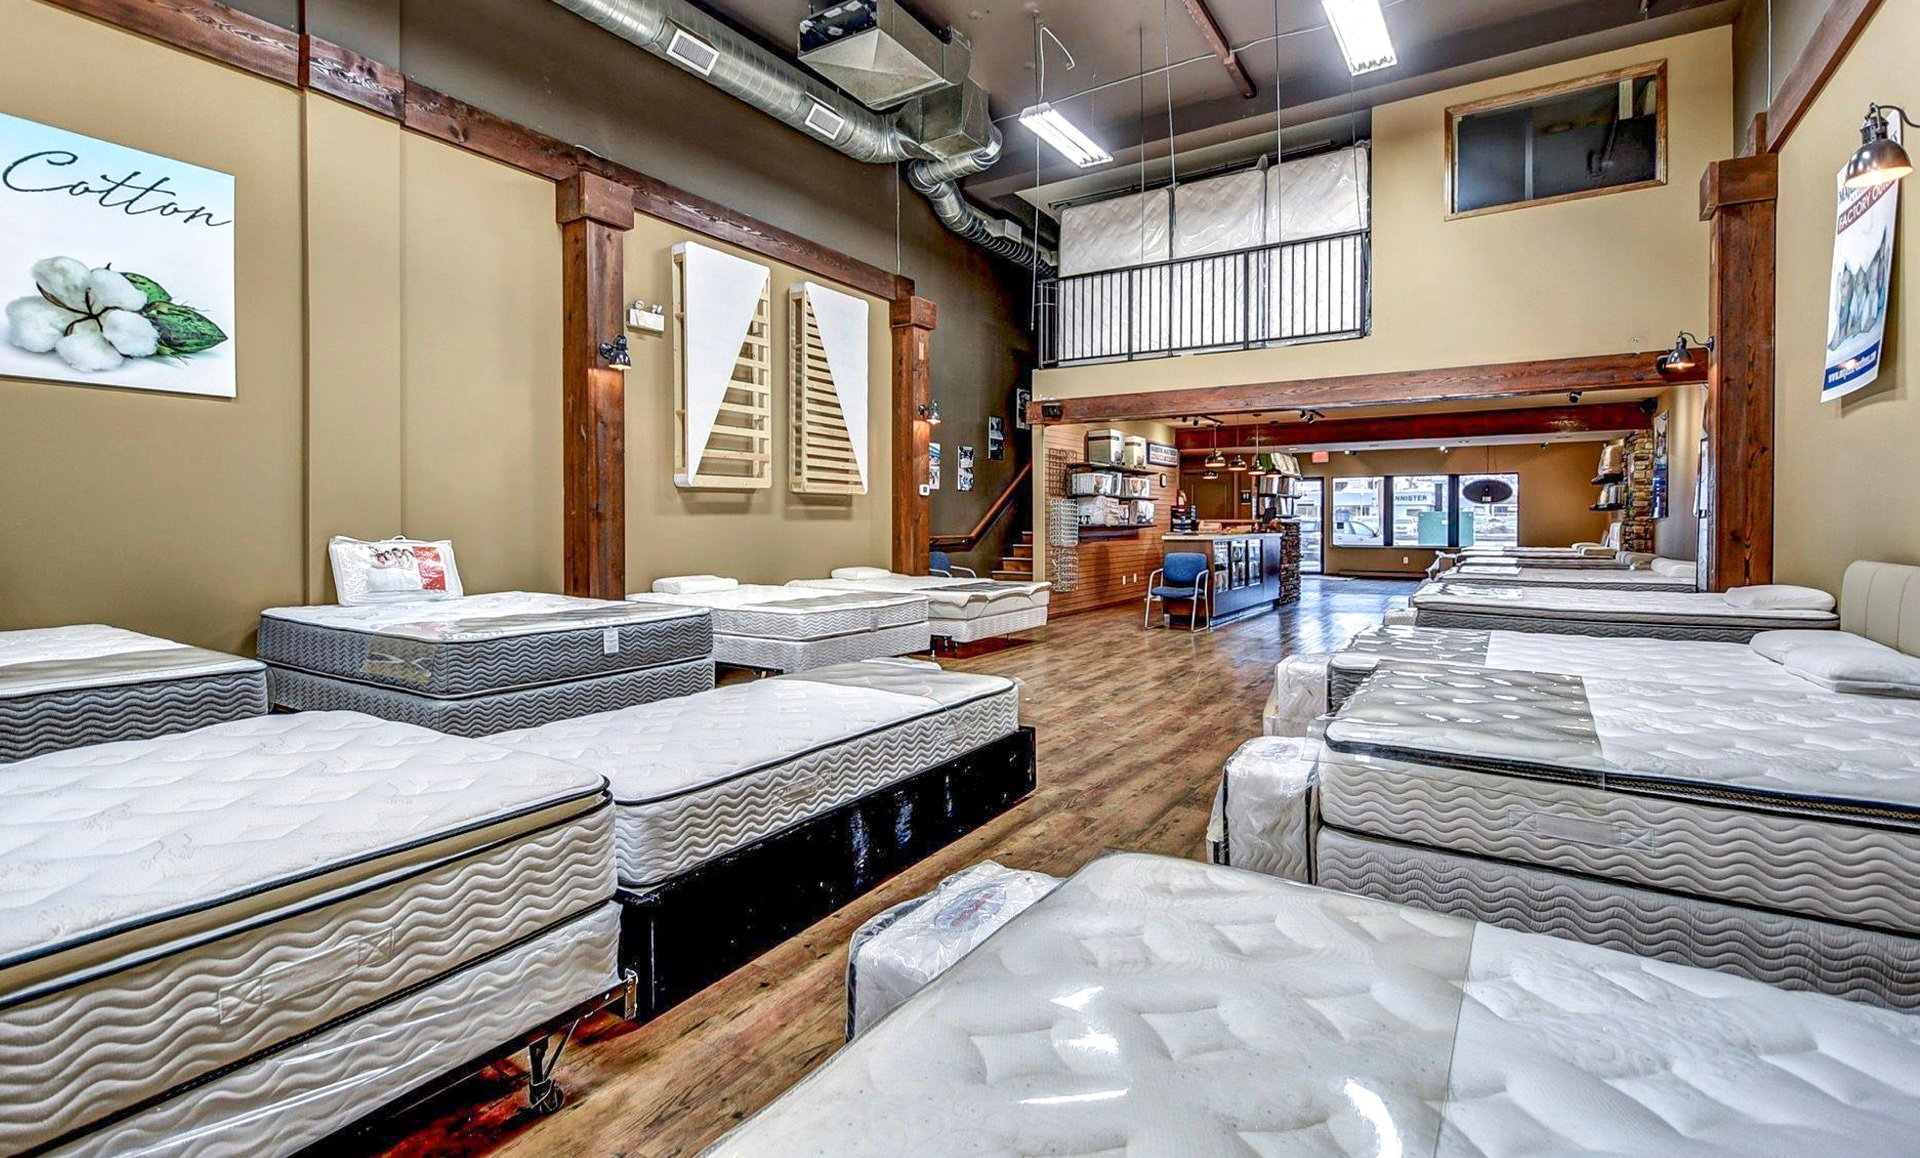 mattress retail marketing showroom image